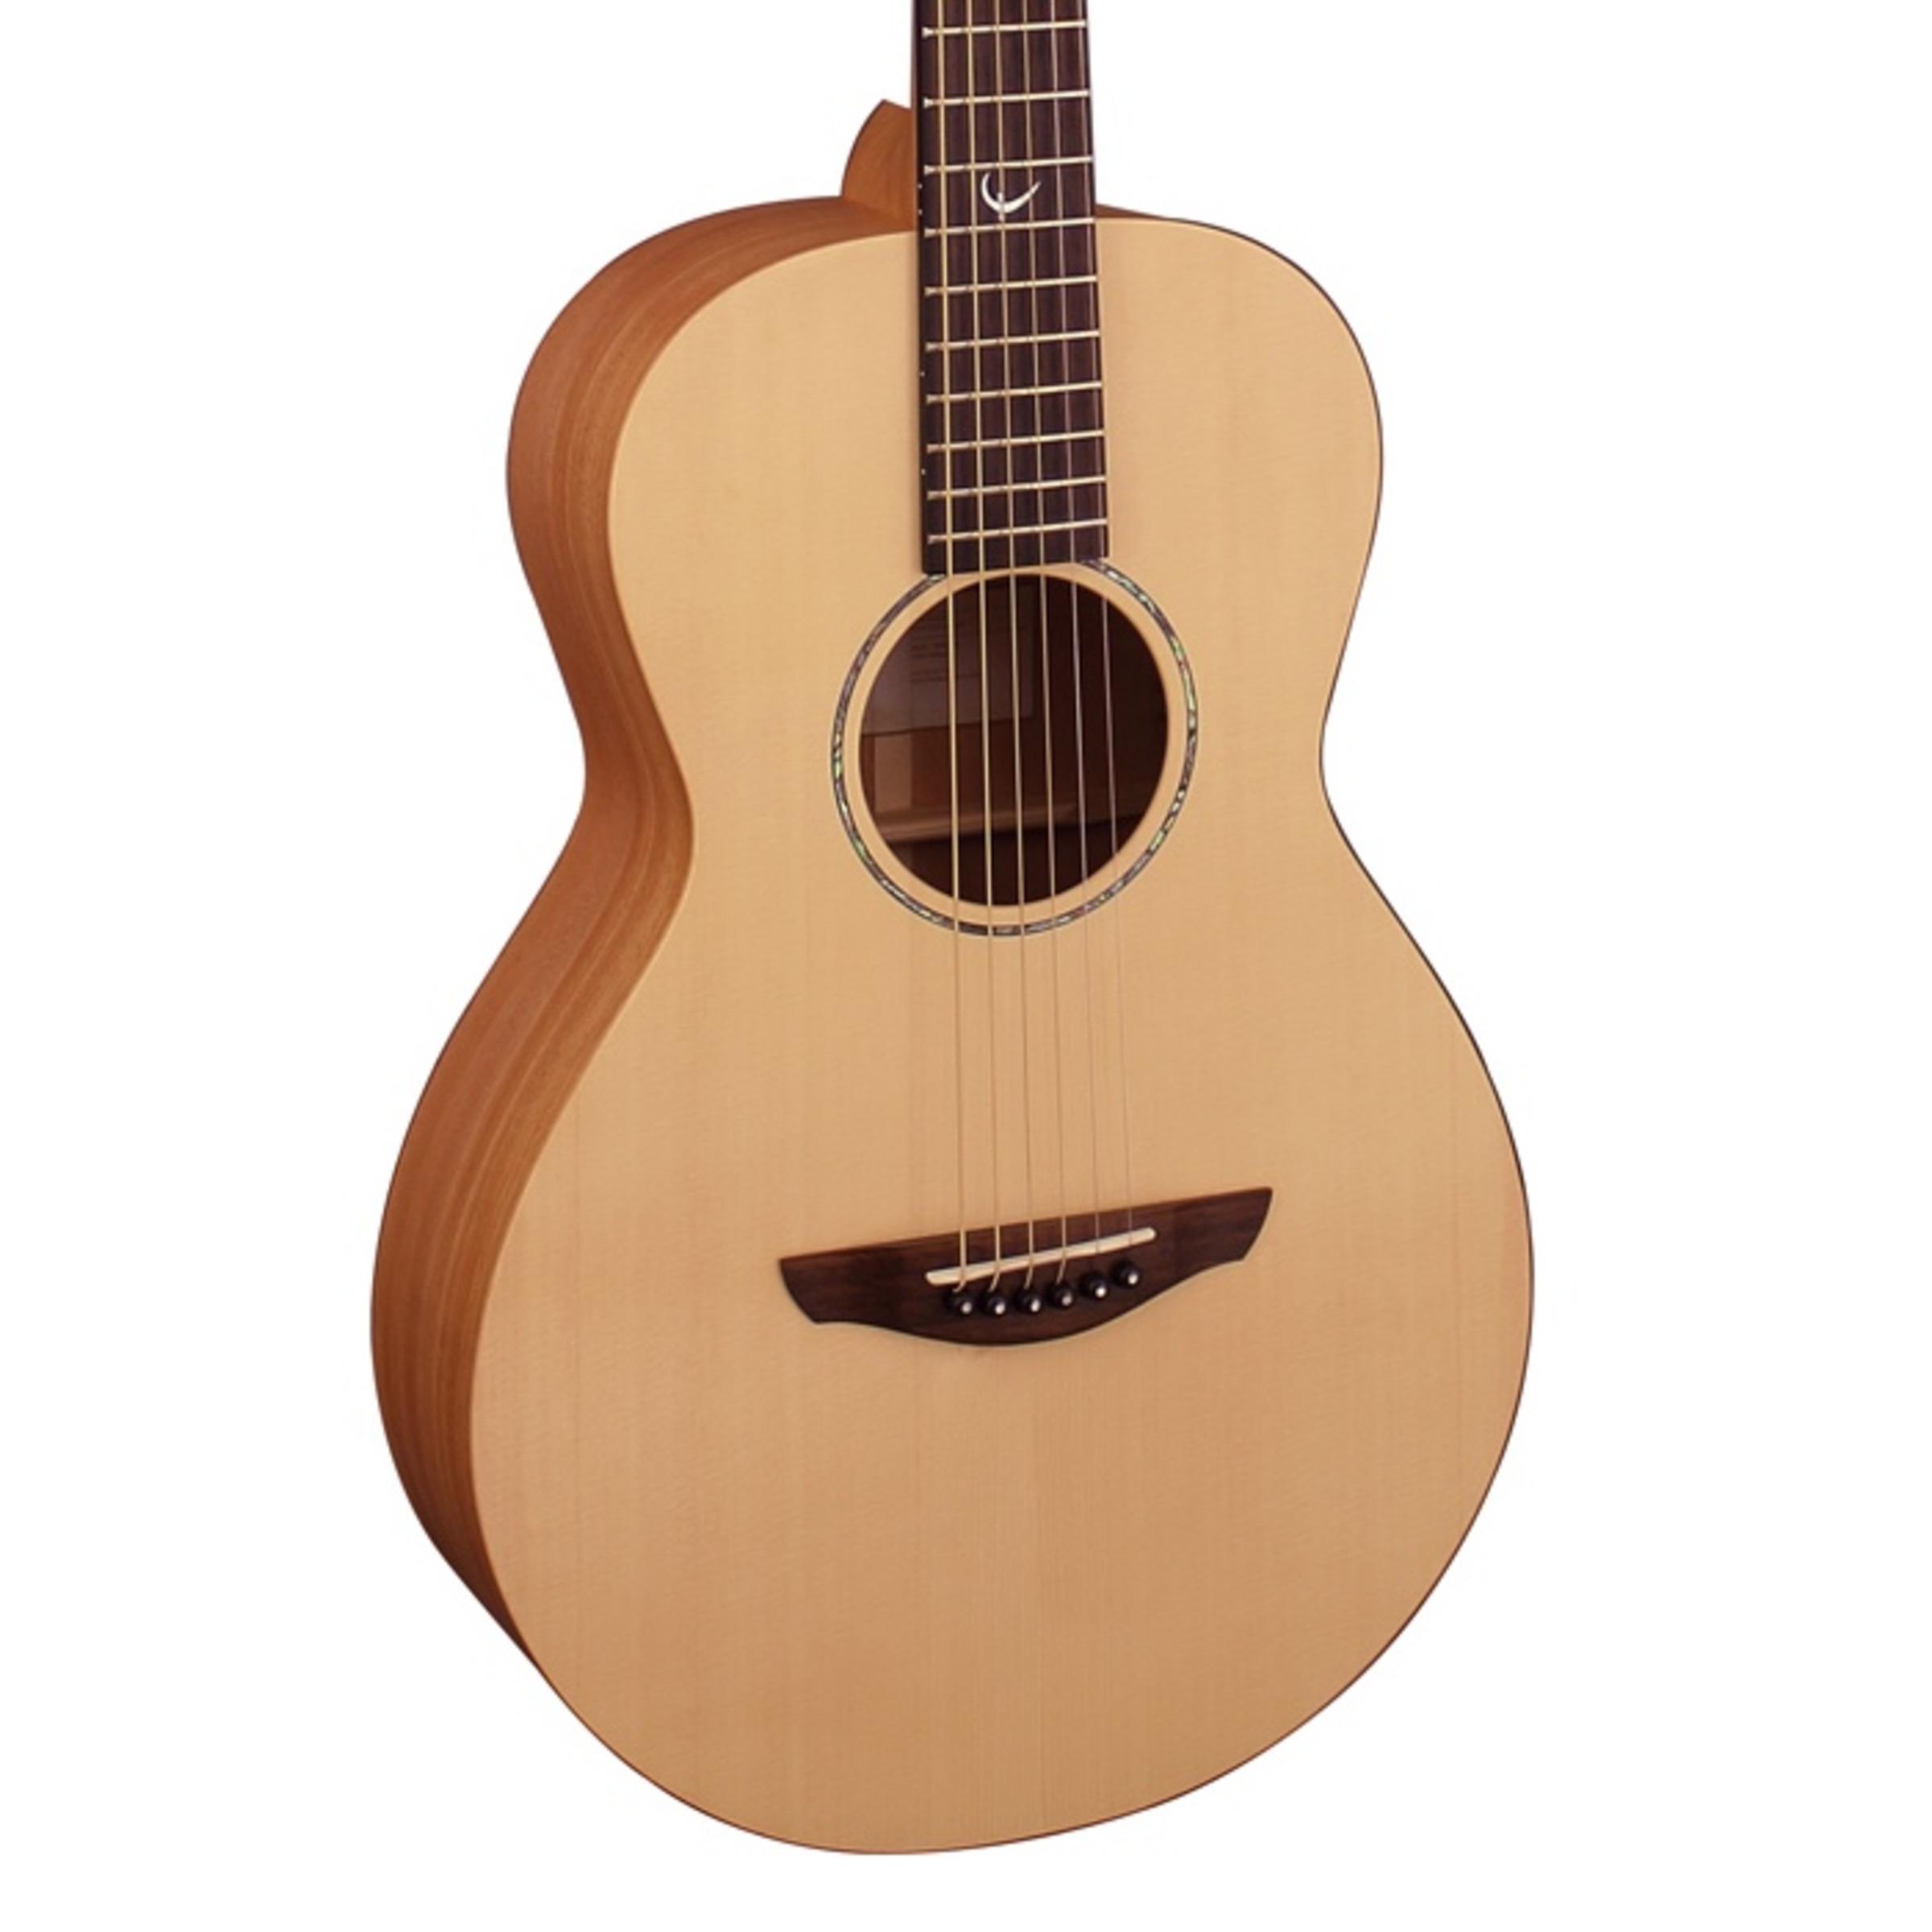 Faith Naked Series Saturn Dreadnought Acoustic Guitar All